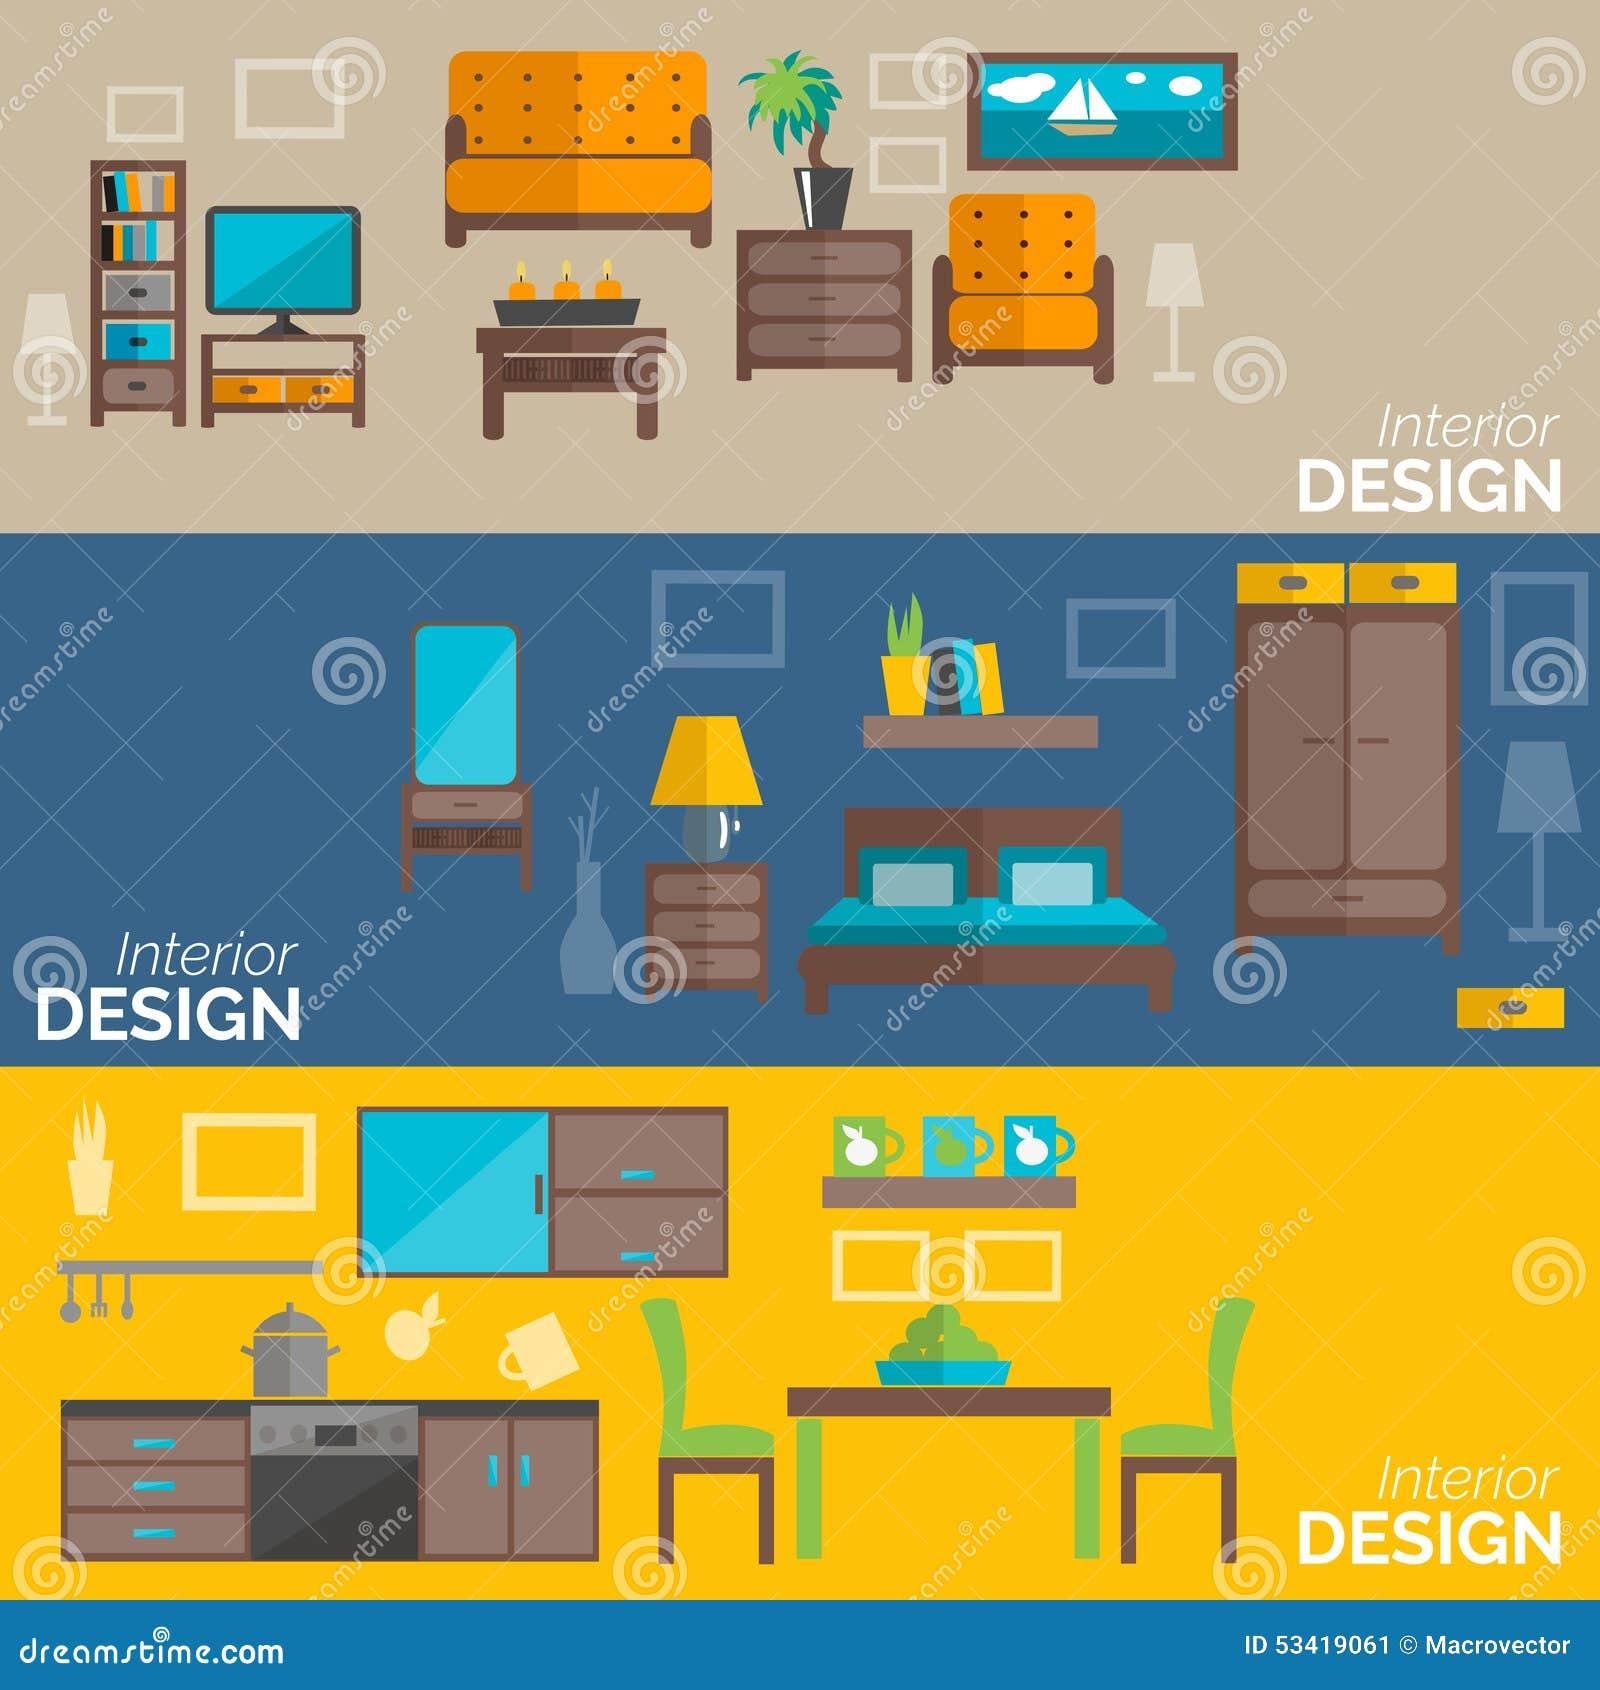 Home furniture design flat banners set stock vector for Interior design banner images